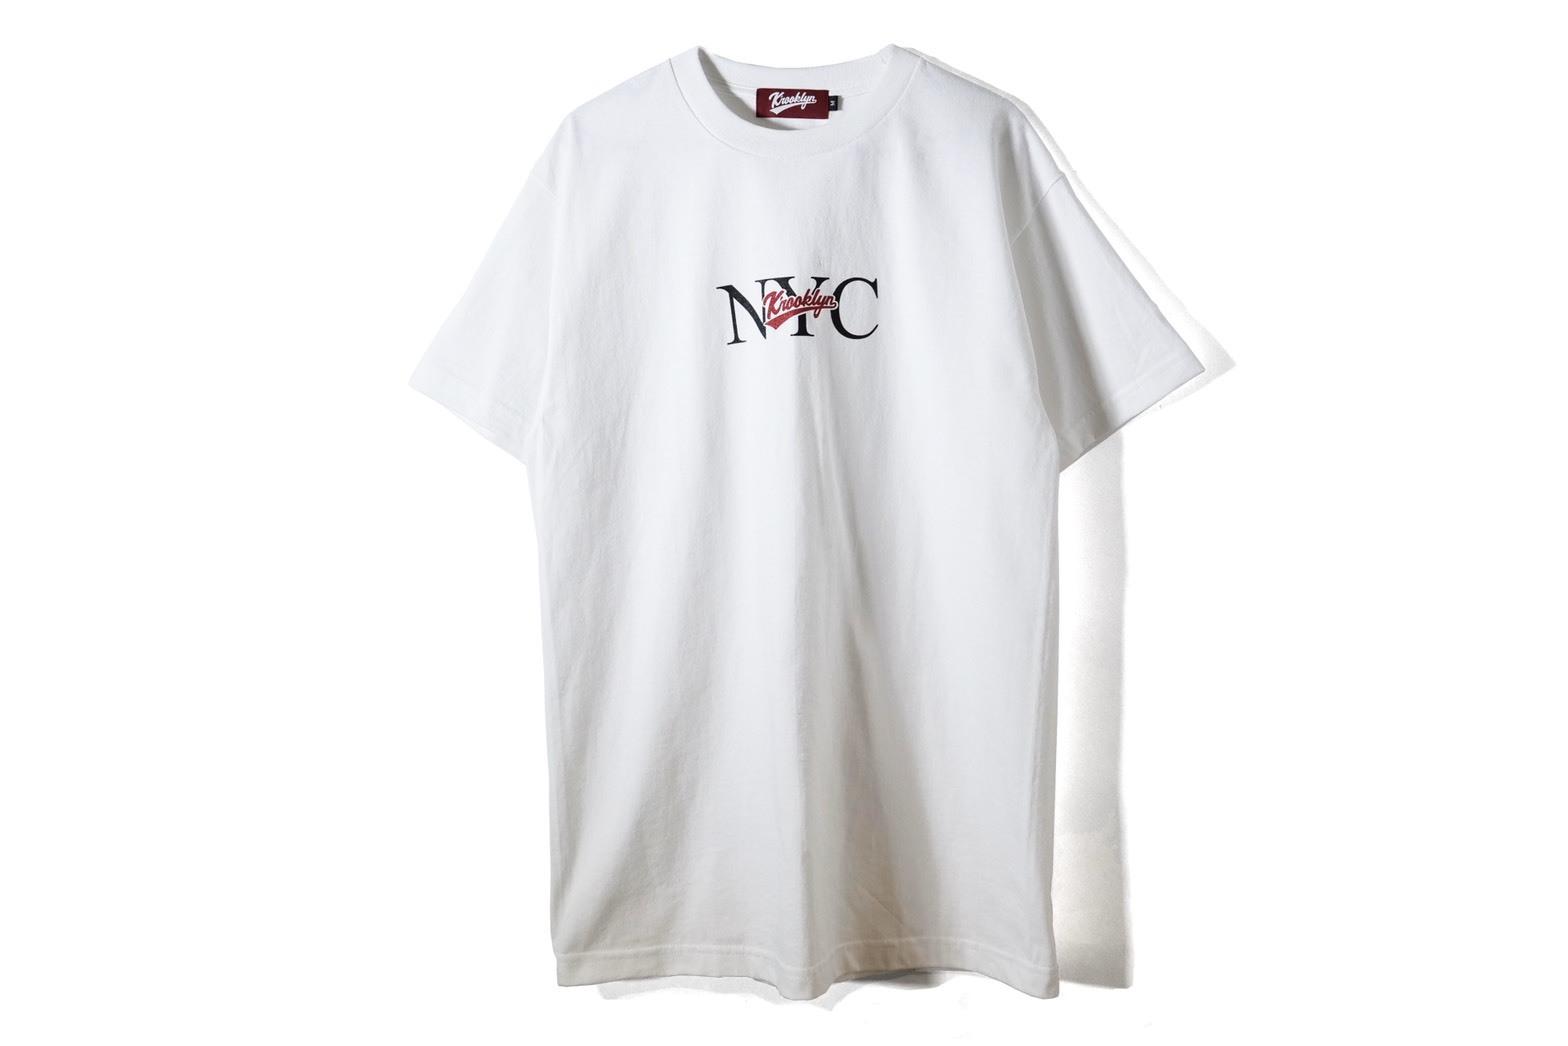 NYC LOGO T-SHIRT - White